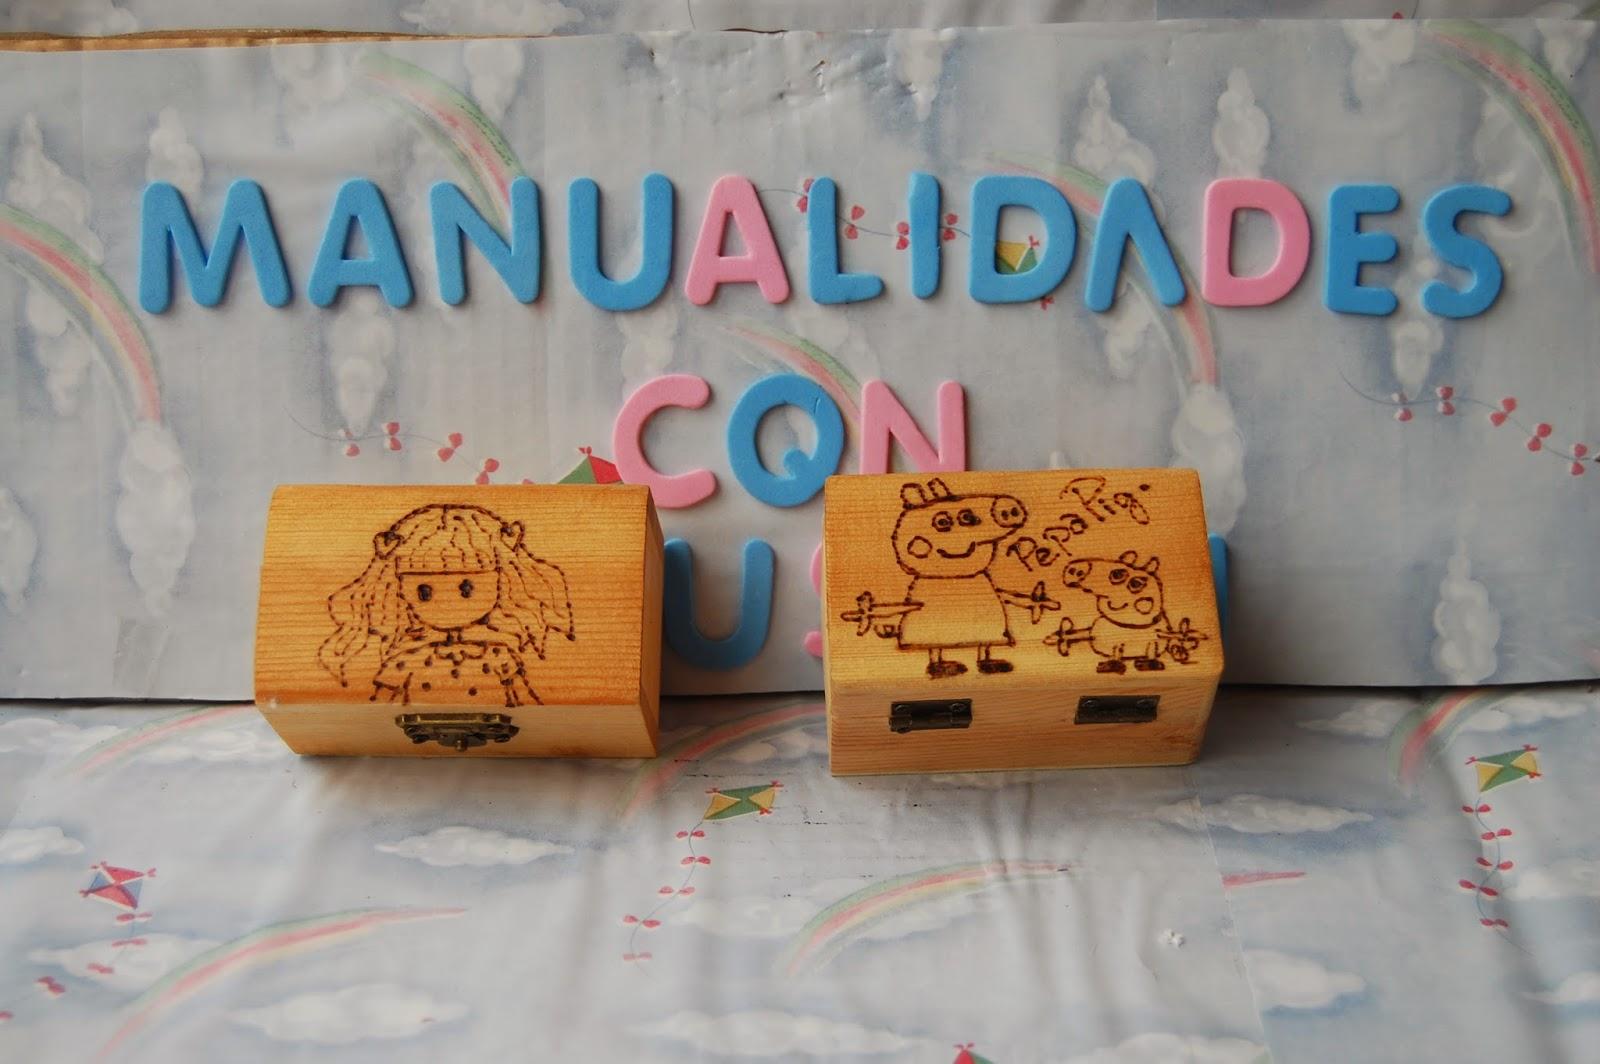 Manualidades con ilusion cajas madera talladas - Manualidades cajas madera ...